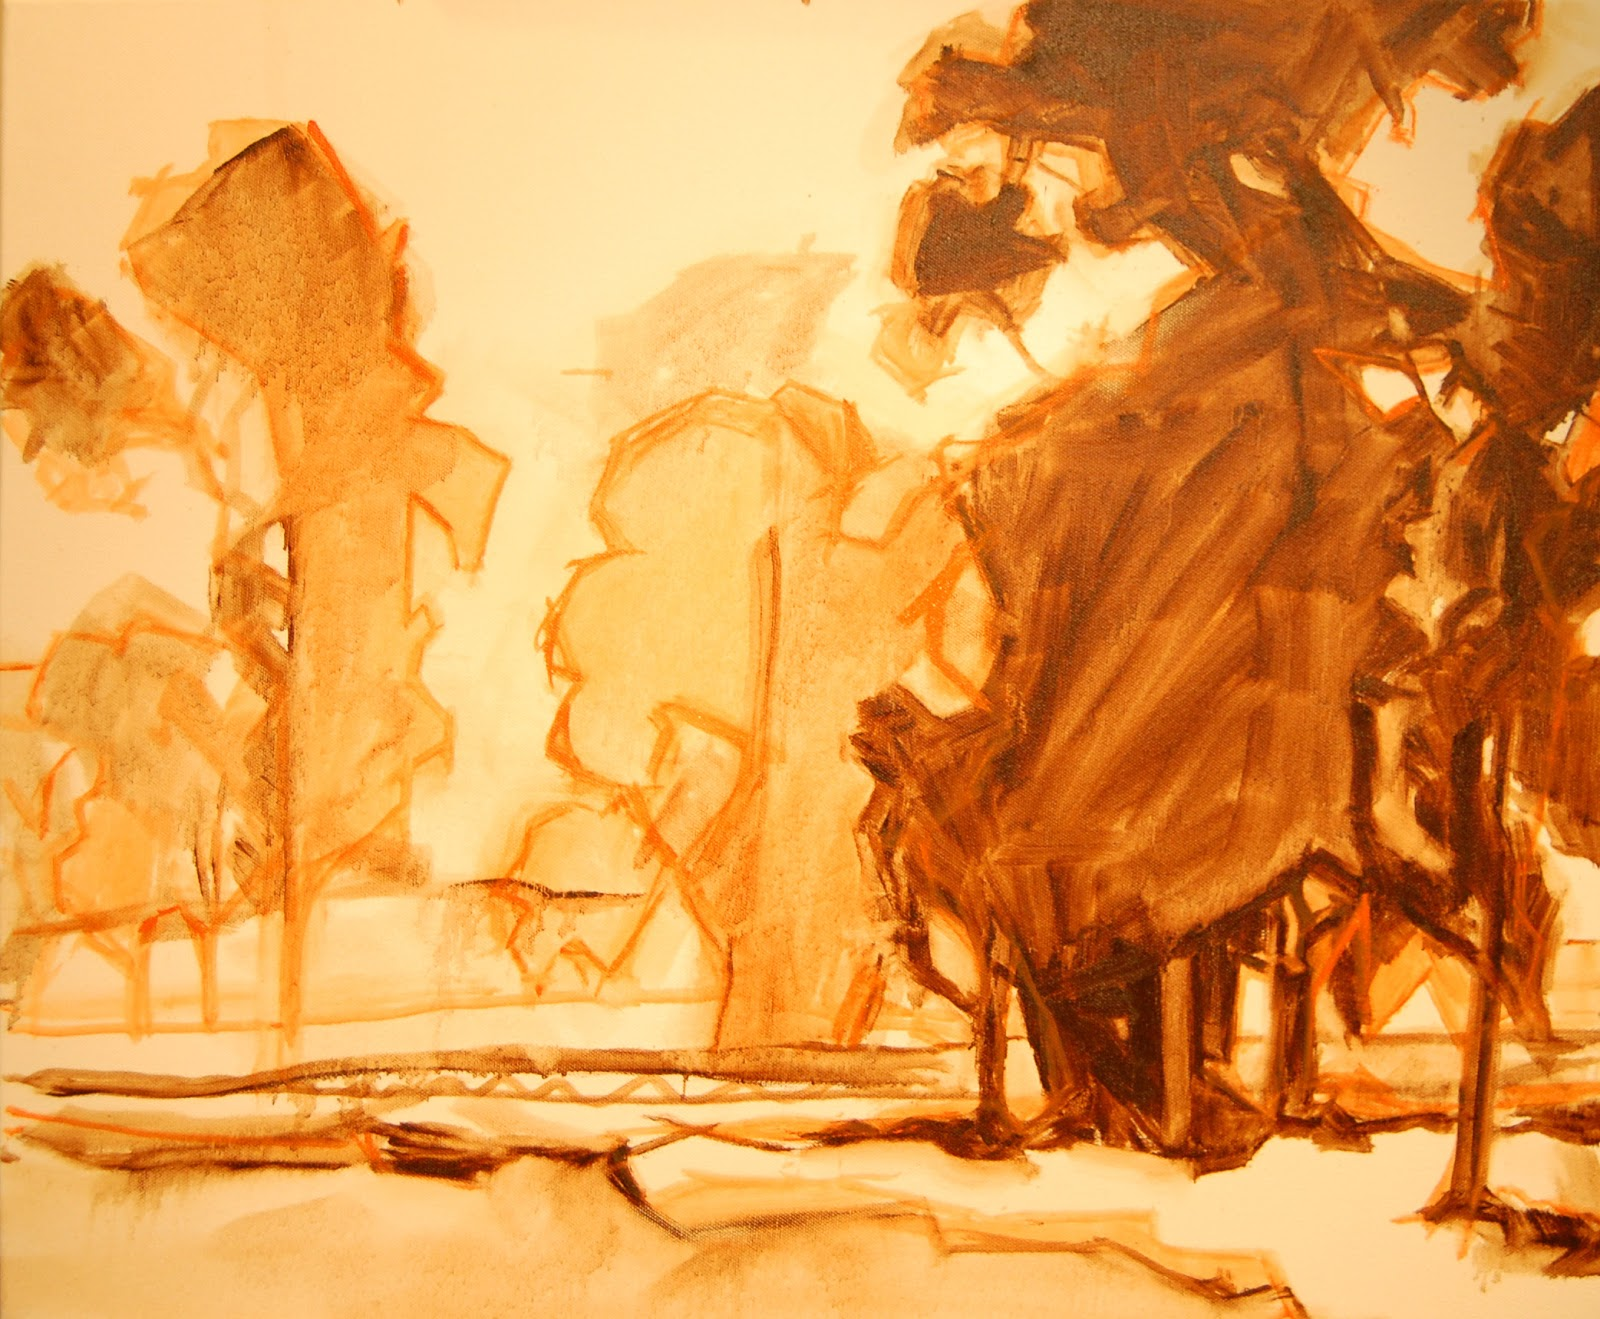 Edgar Payne Palette